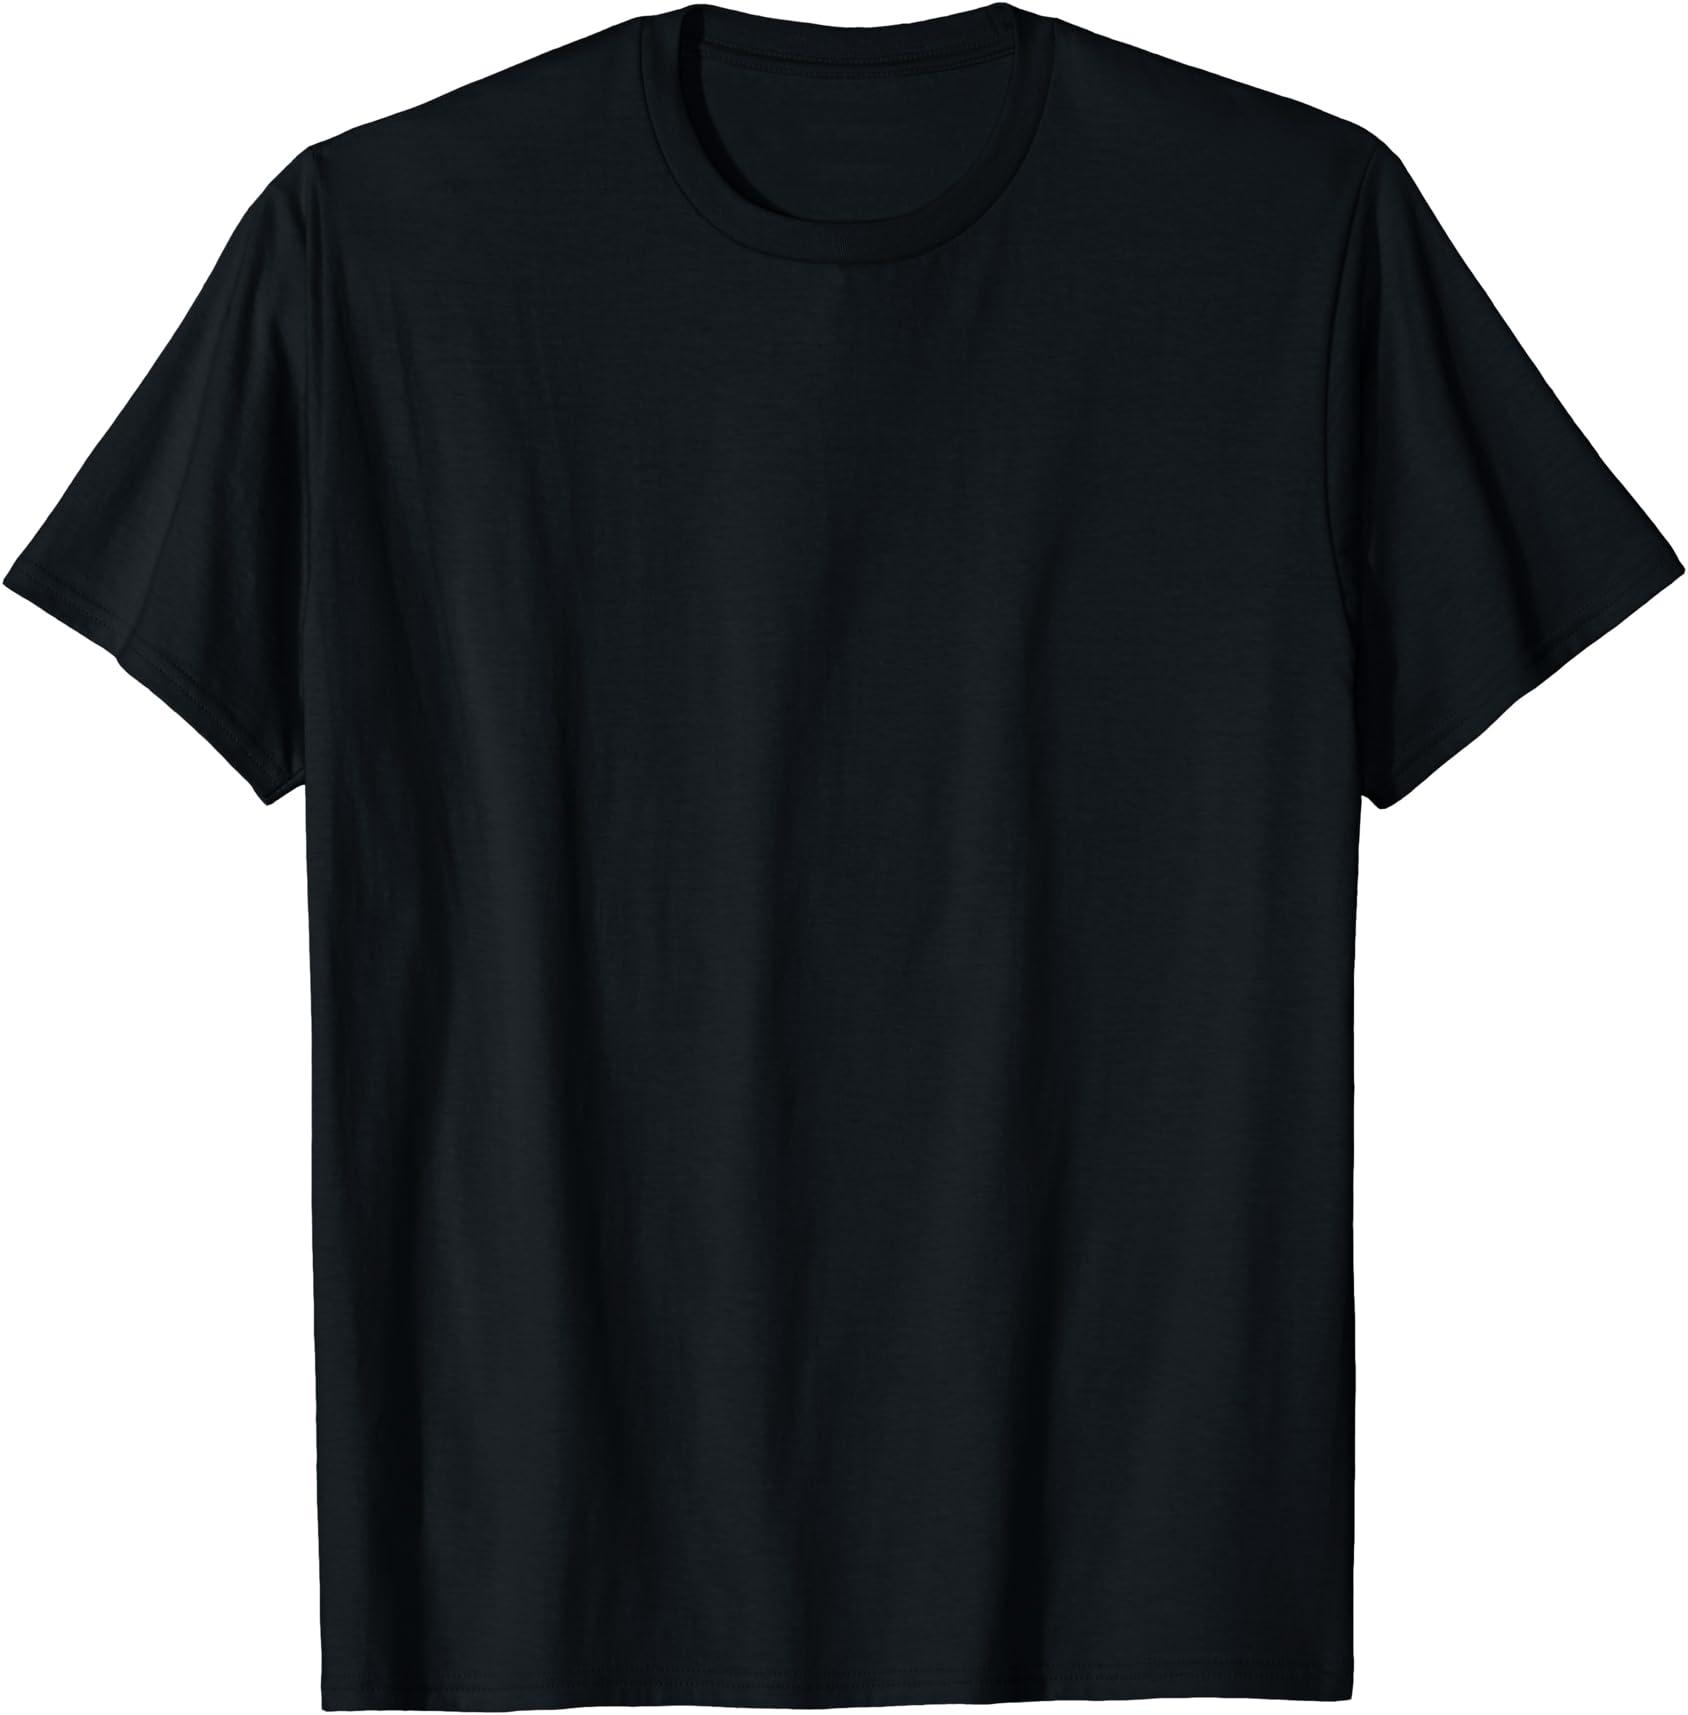 New Raiden Retro 80s 90s Video Game Logo Men/'s Black T-Shirt Size S to 3XL